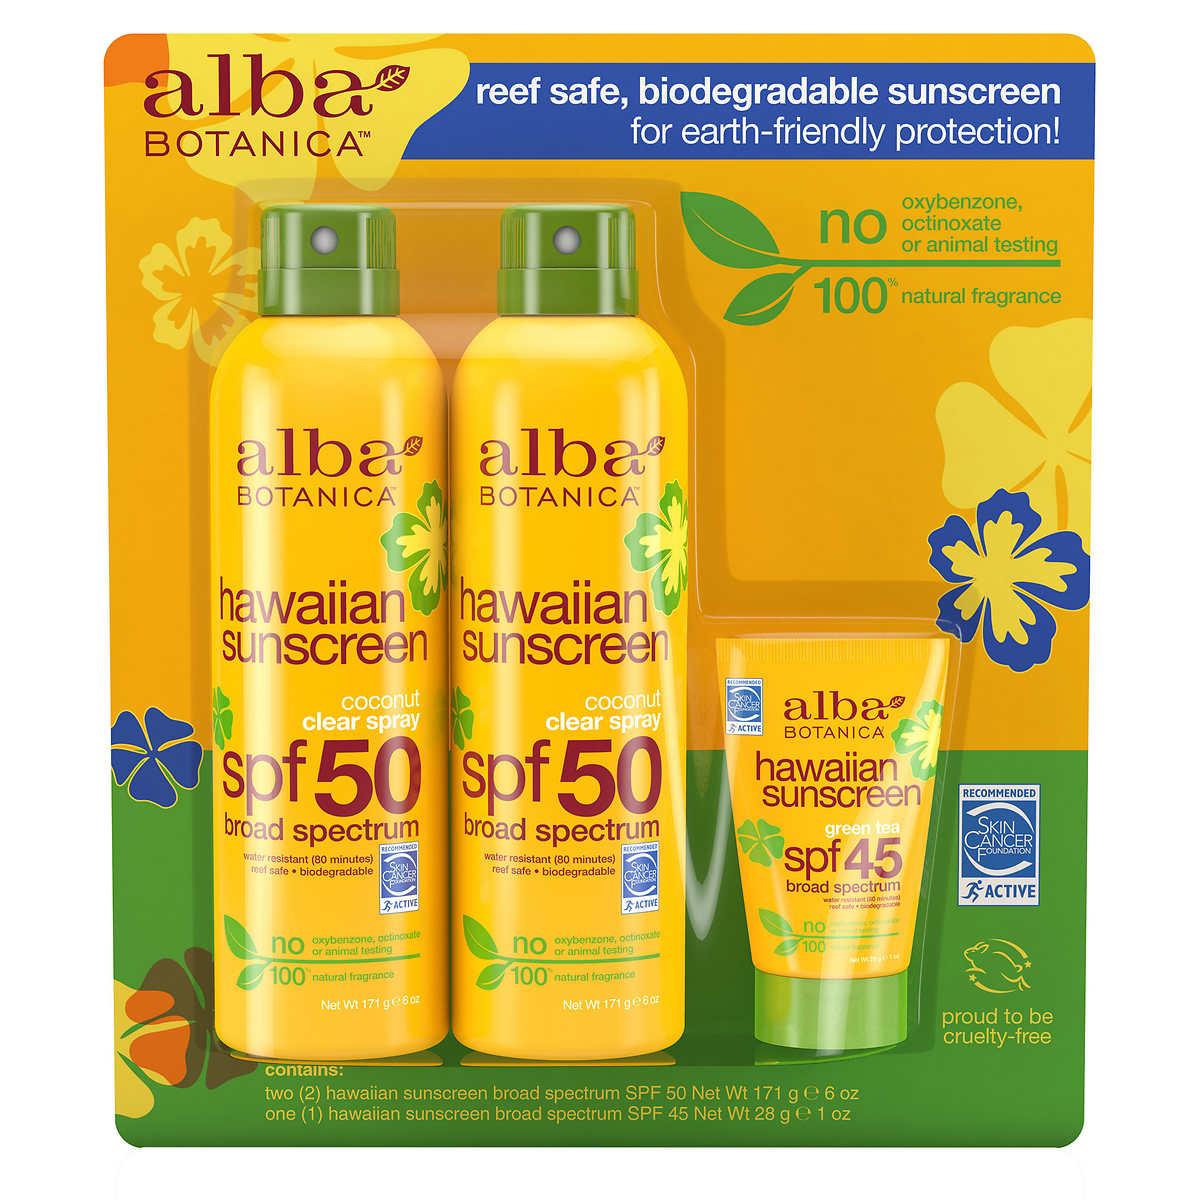 alba botanica hawaiian sunscreen spf 50 reviews